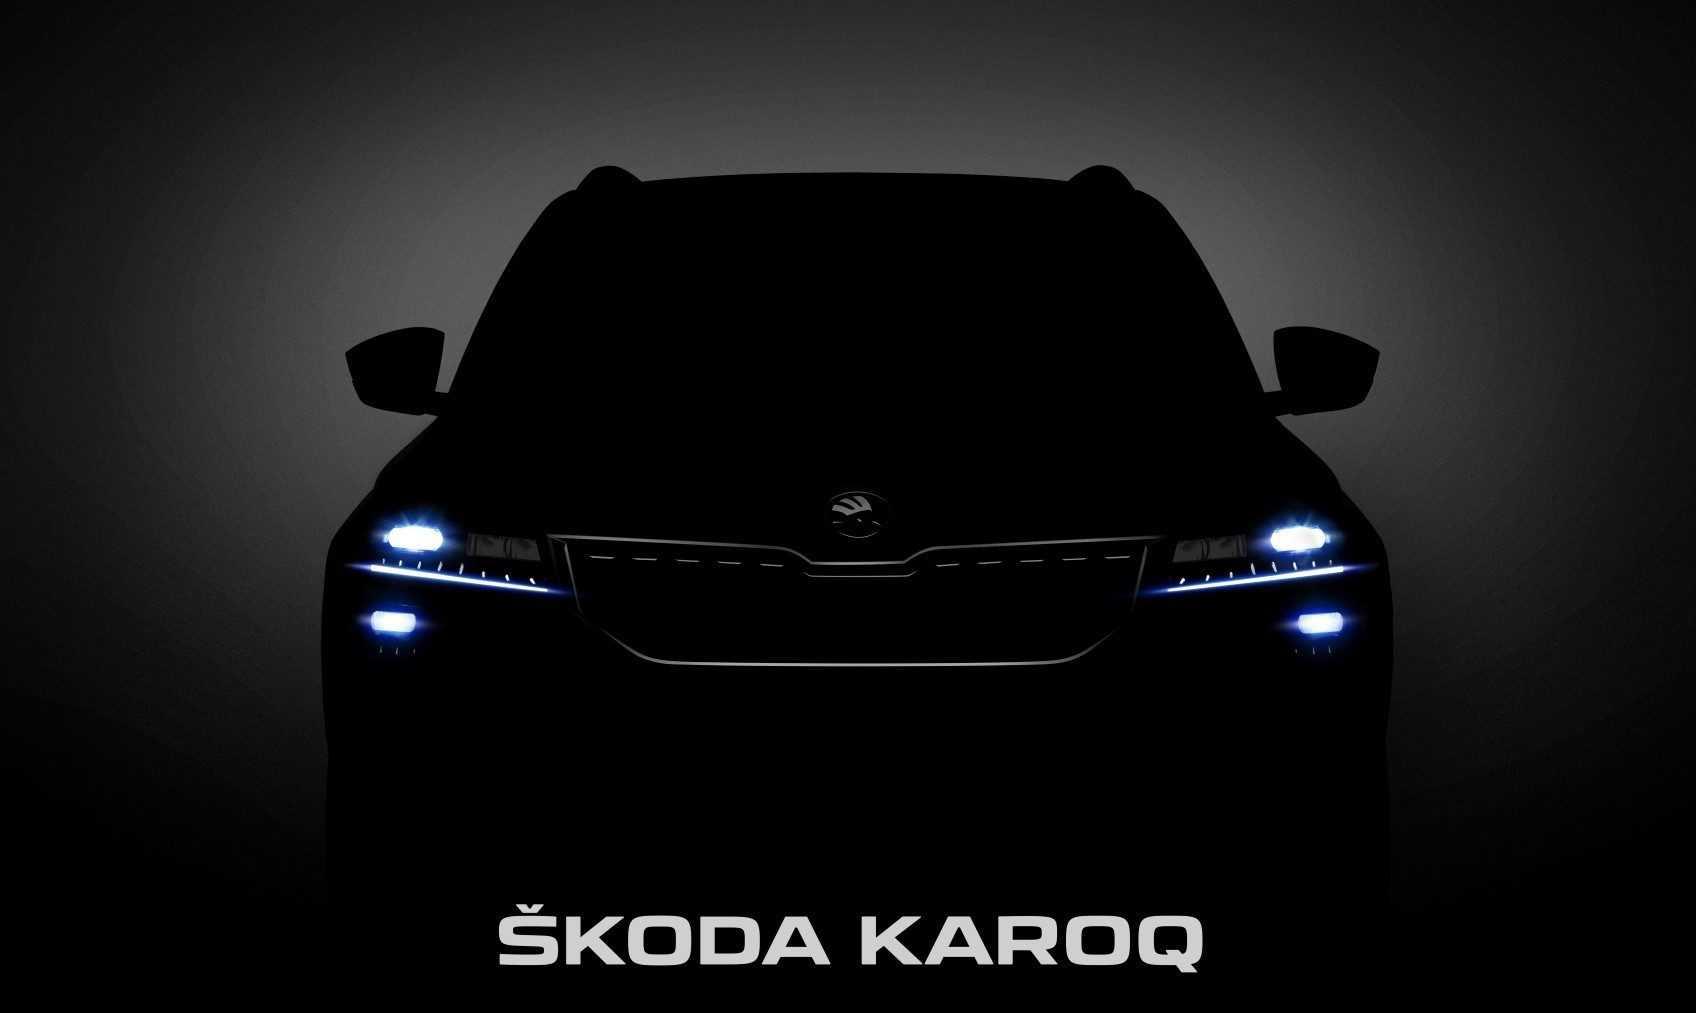 Škoda Karoq 2017